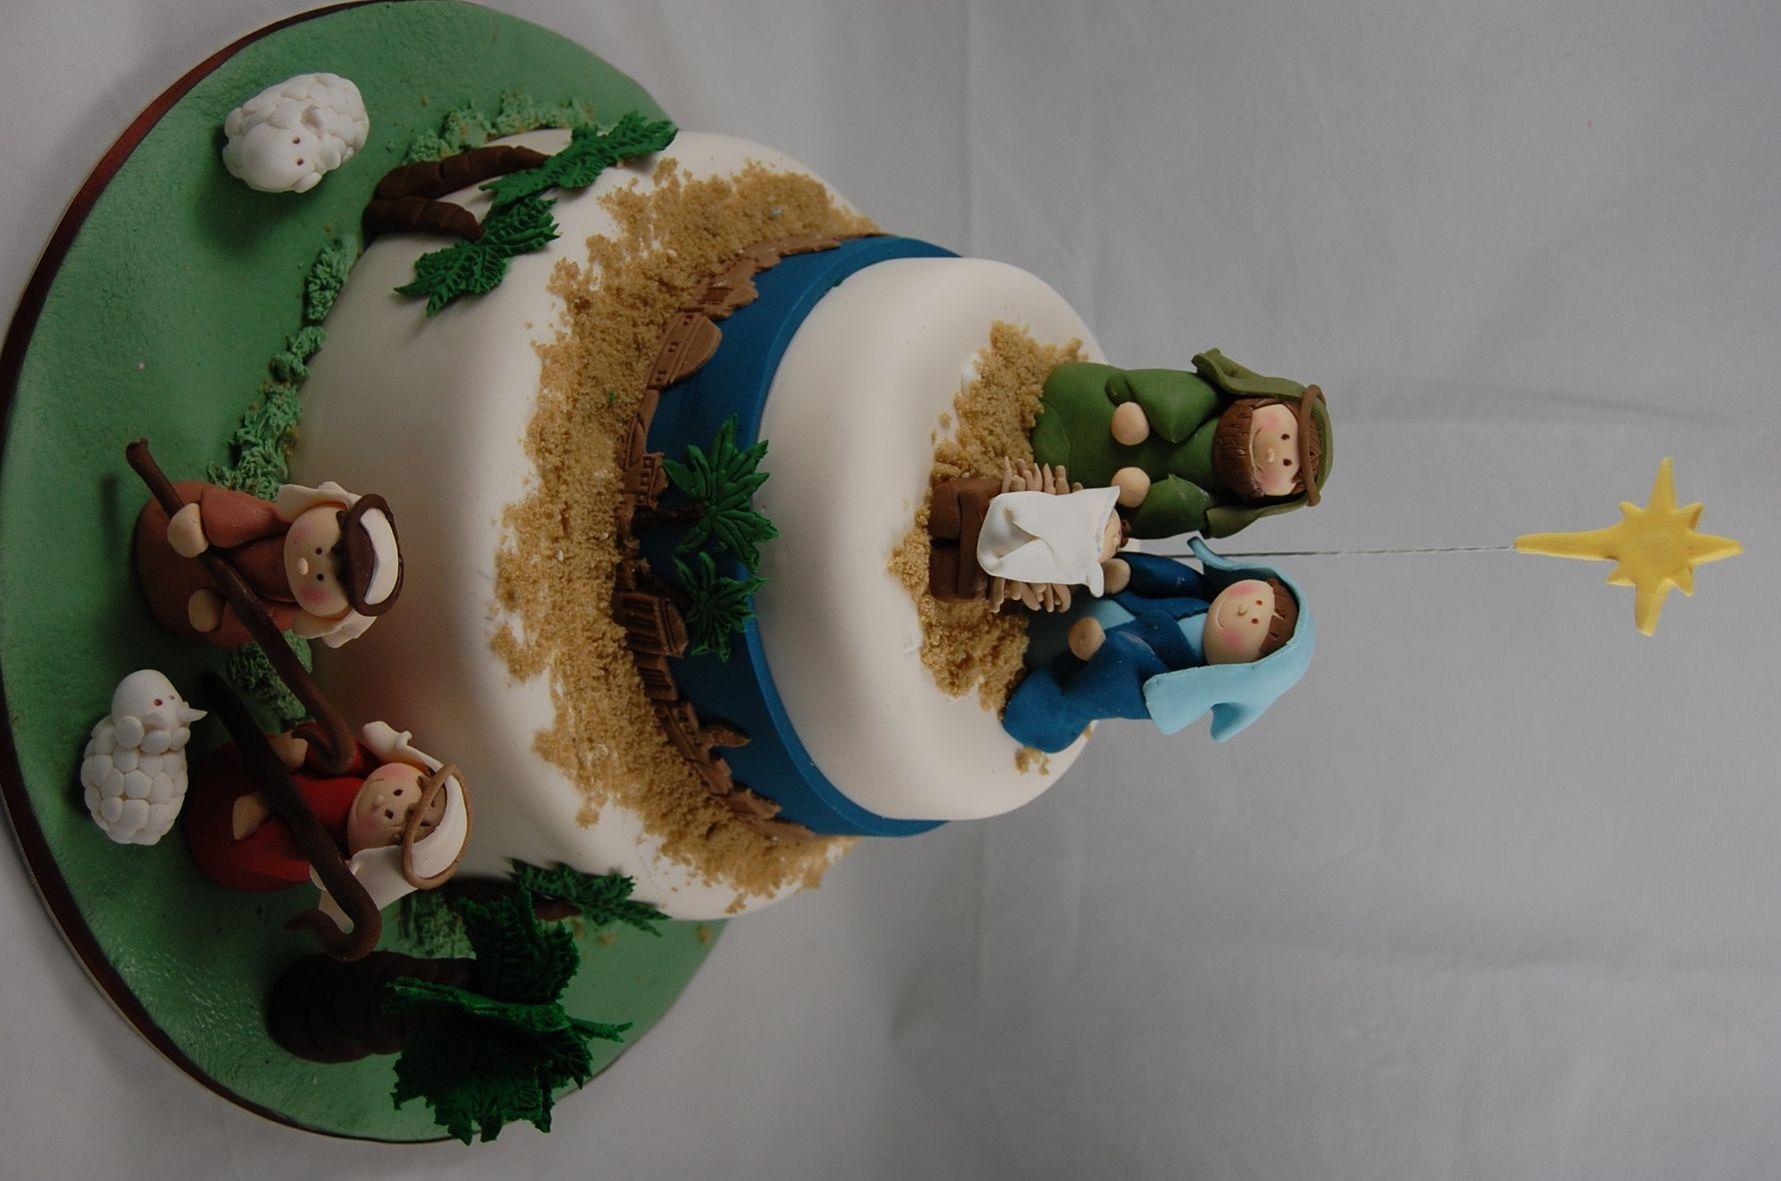 Nativity Christmas Cake Design : nativity cake Cake ideas Pinterest